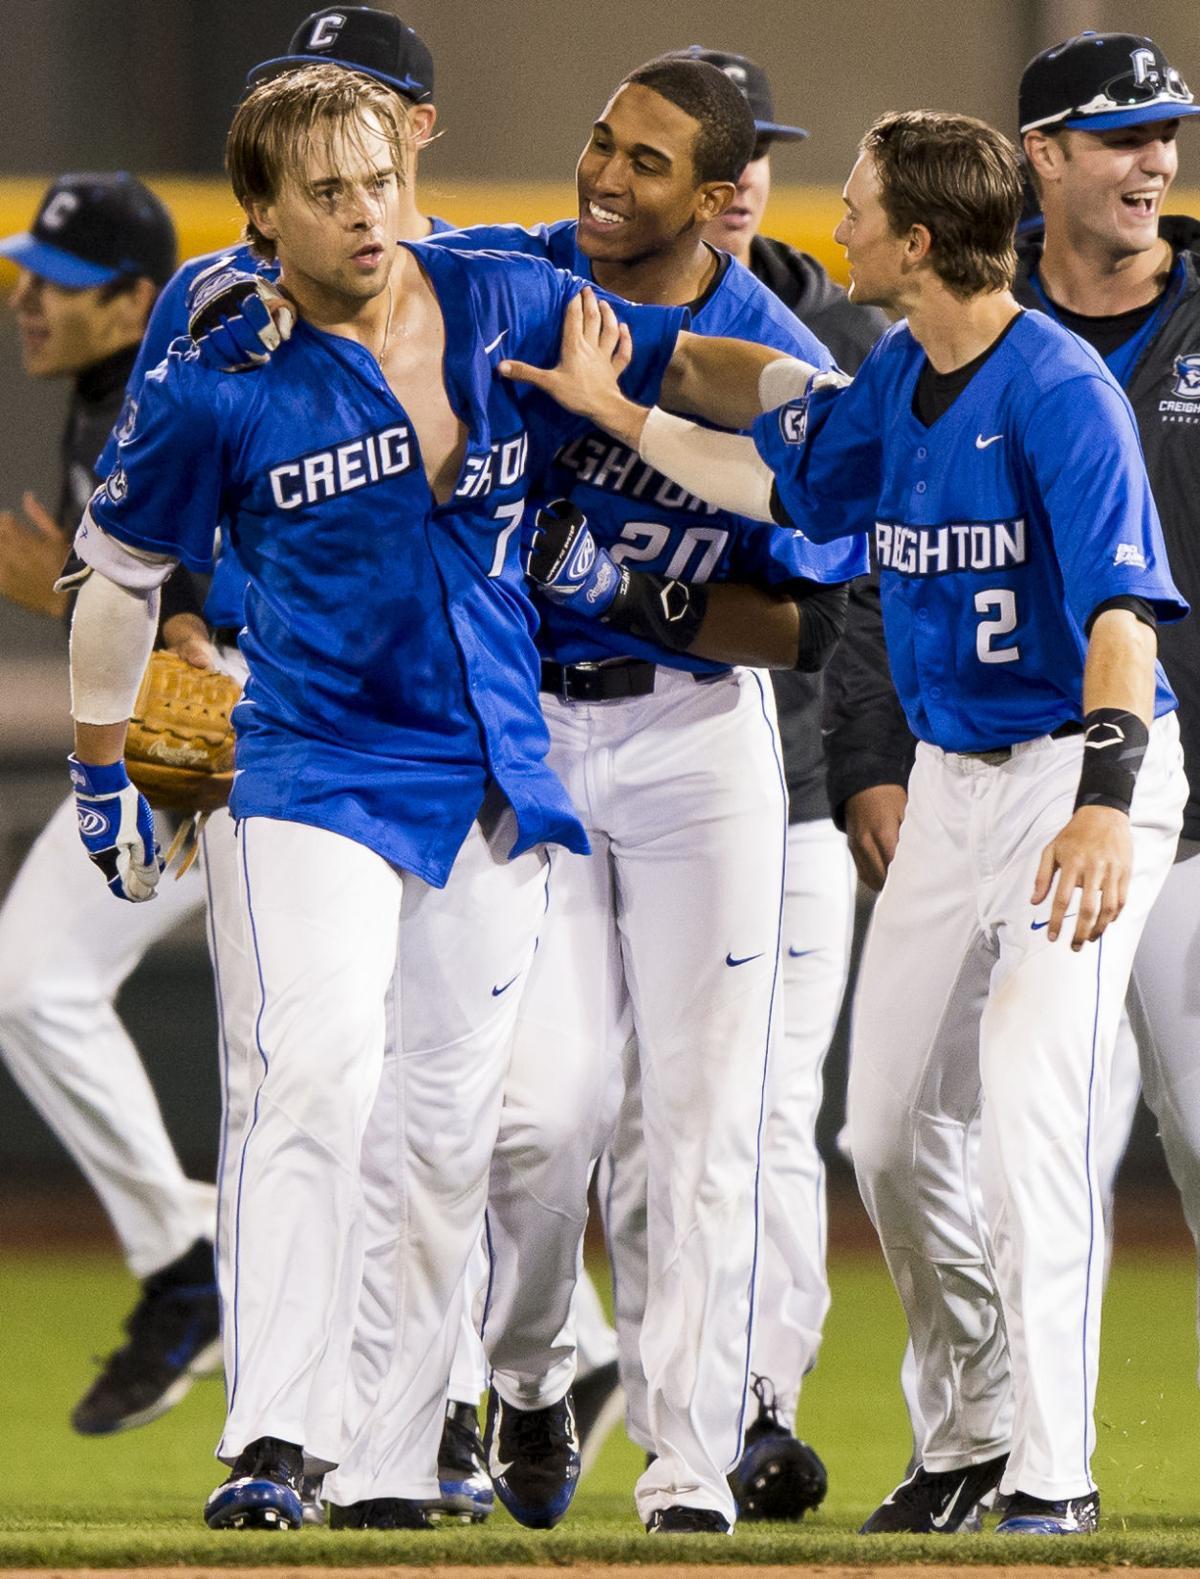 arrives 8914f 6fa4e Creighton walk-off snaps losing streak to Huskers | Baseball ...